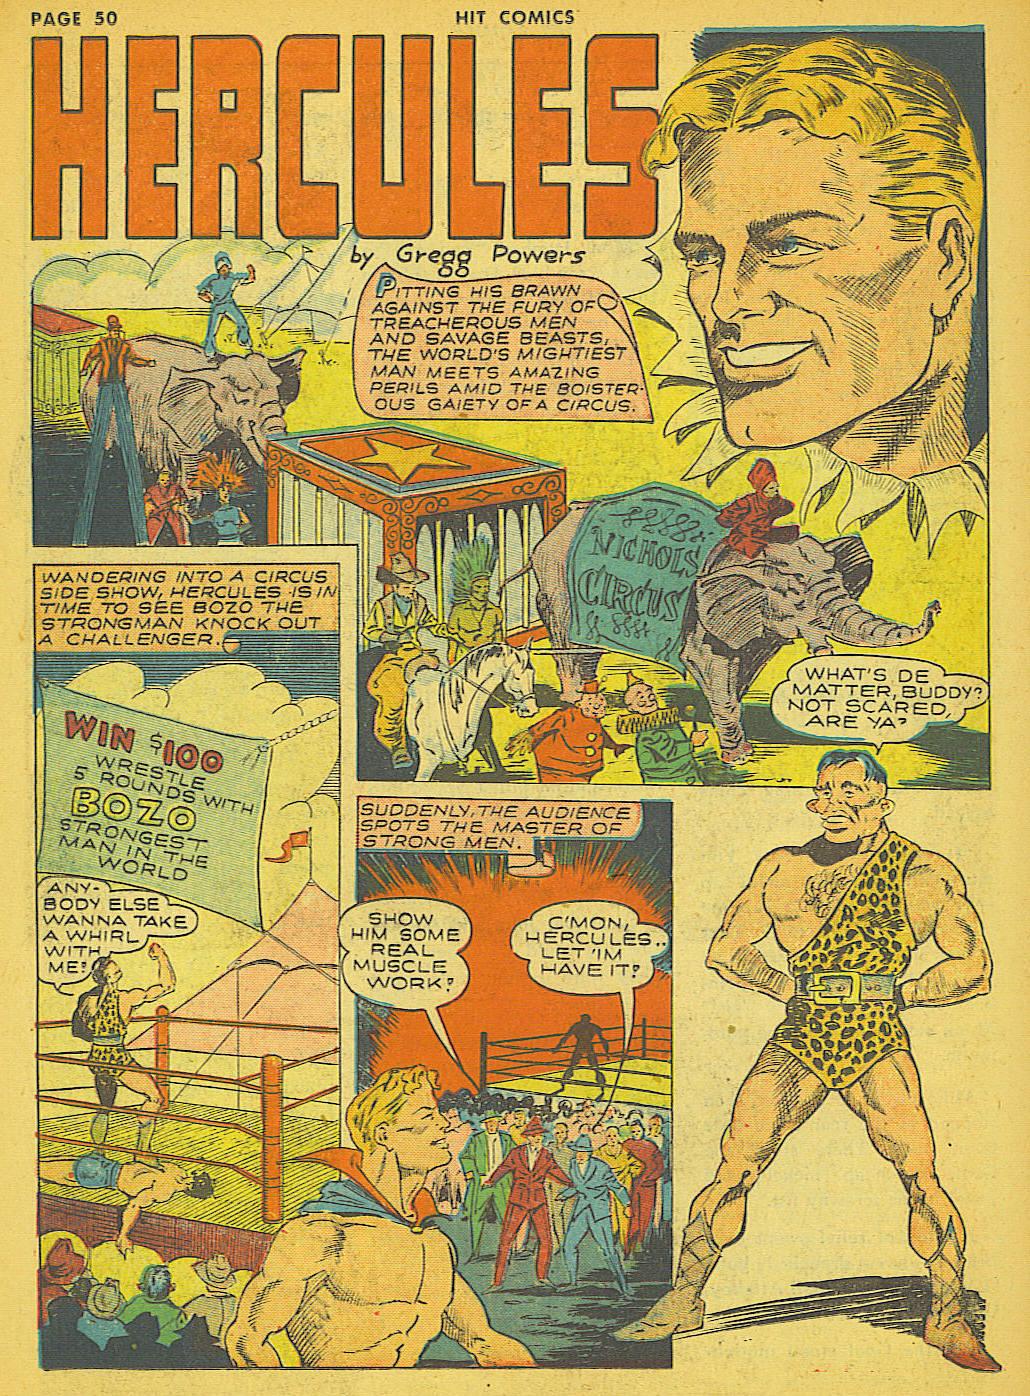 Read online Hit Comics comic -  Issue #21 - 52